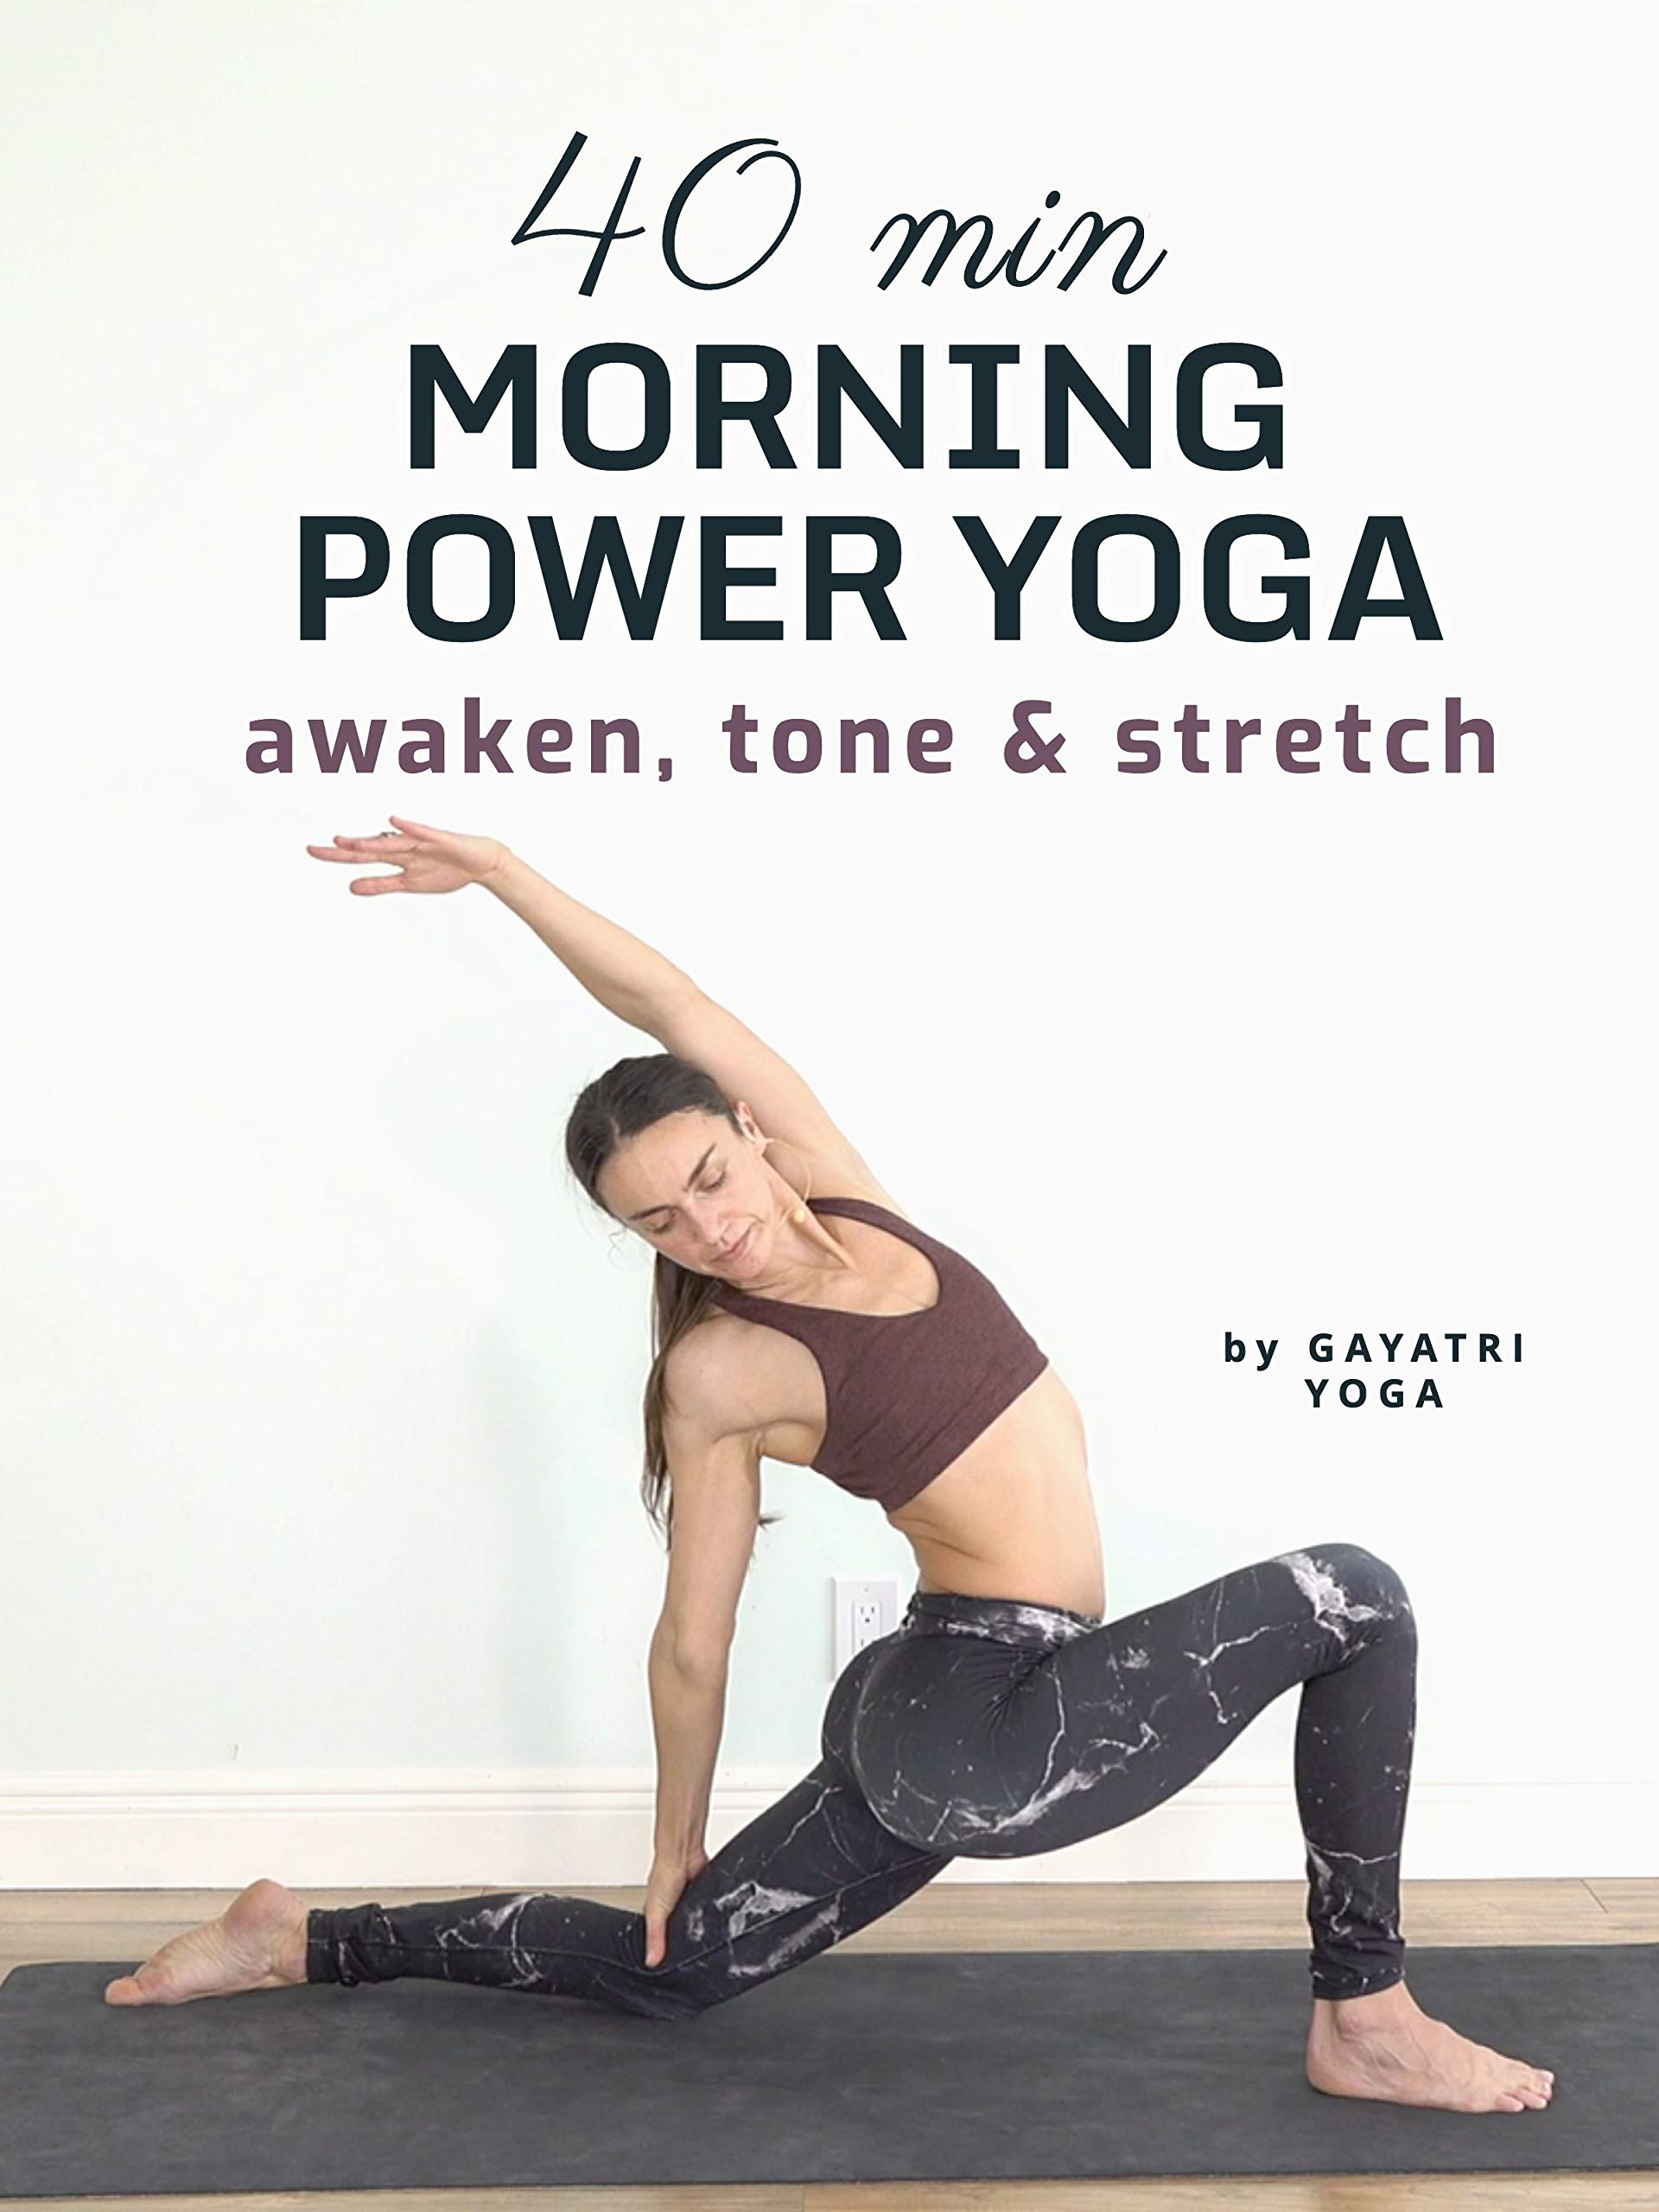 40 Min Morning Power Yoga - Awaken, Tone & Stretch - Gayatri Yoga